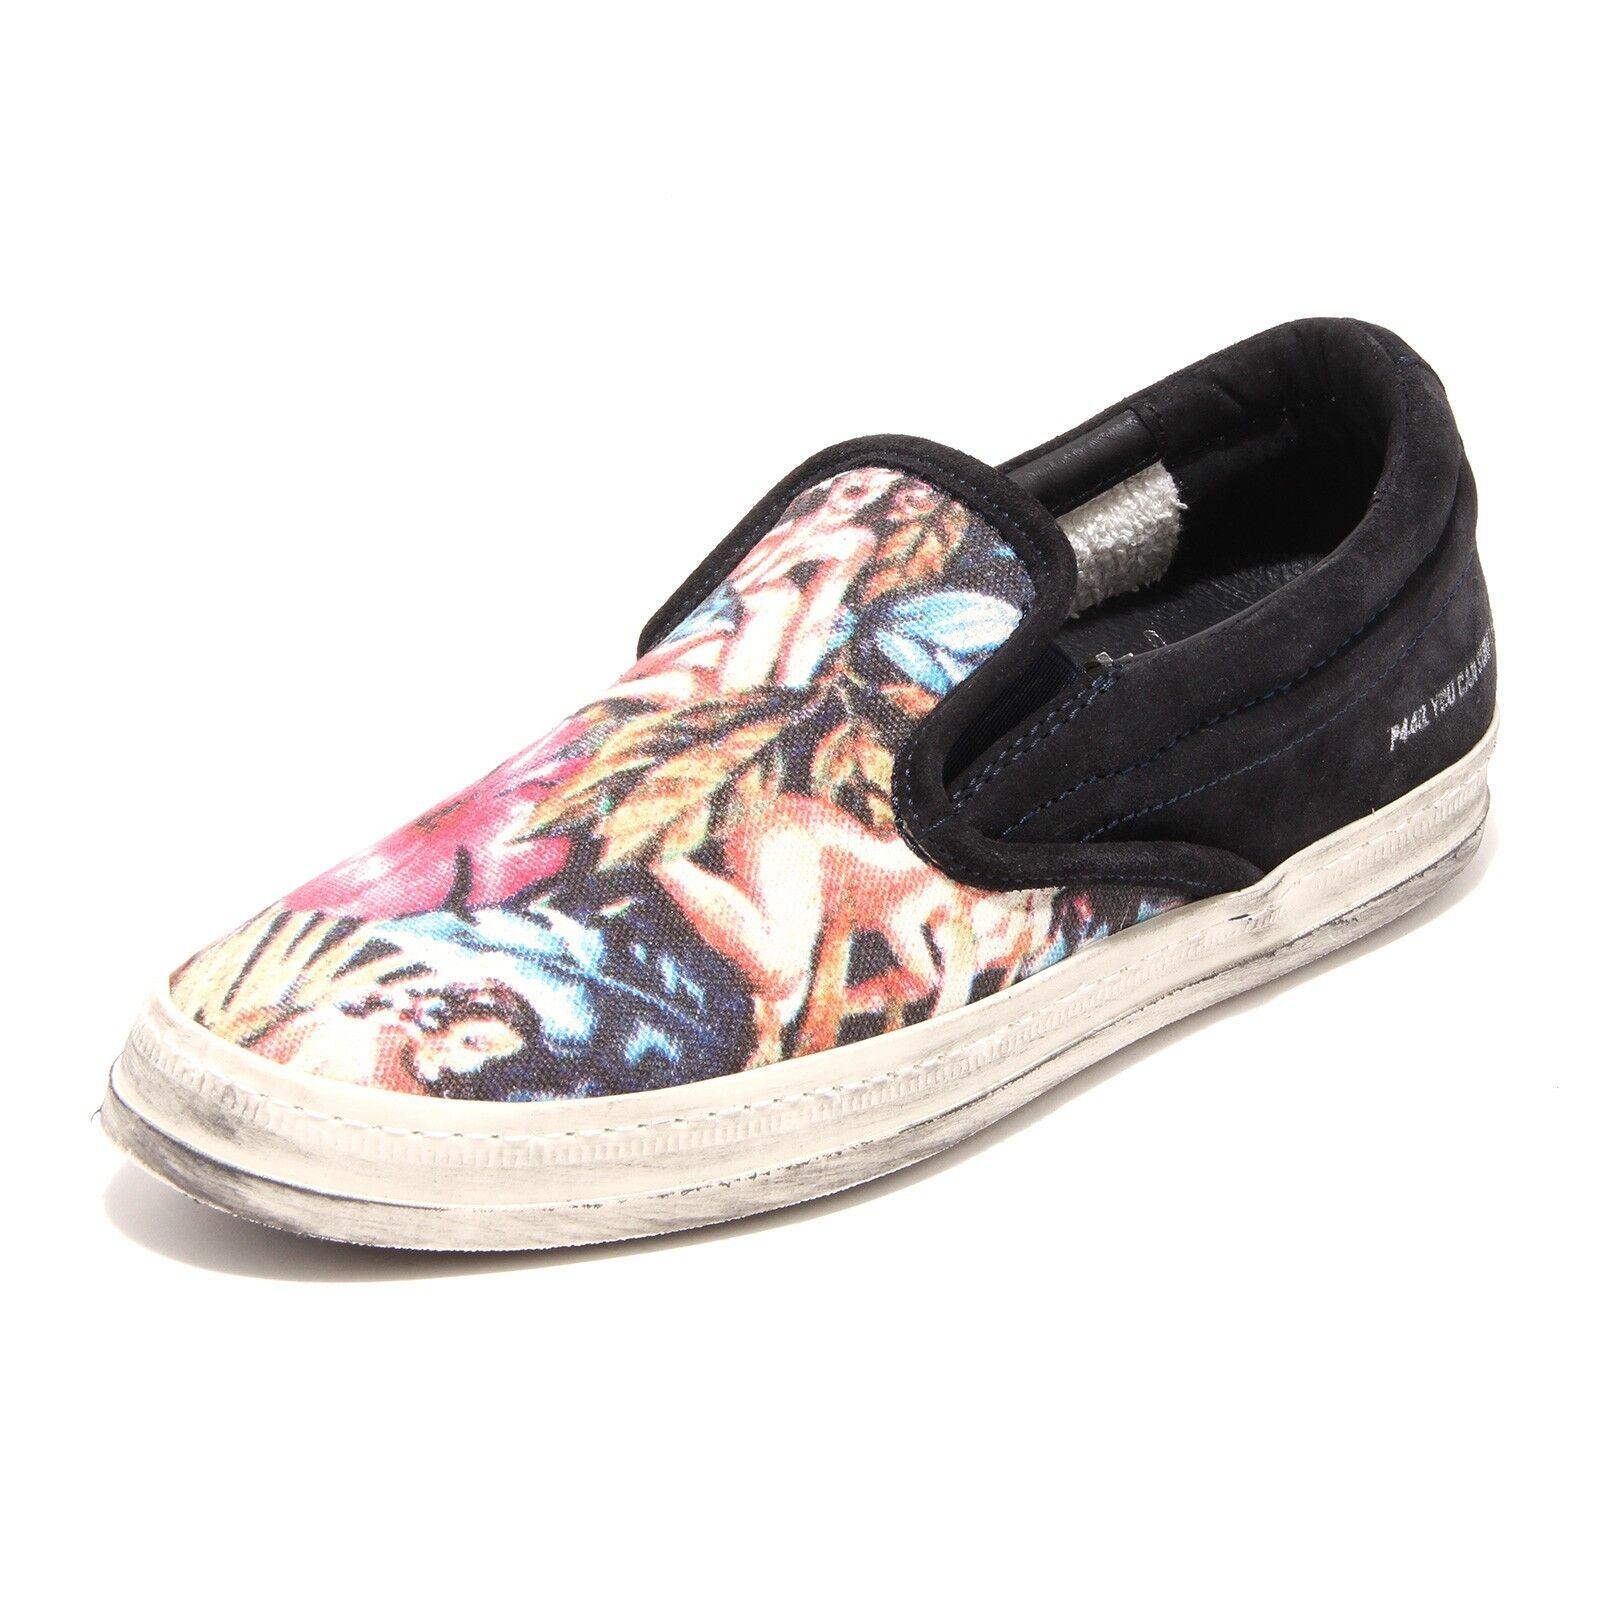 9864G slippers sneakers uomo blu P448 e 4 slip on scarpe scarpa shoes men